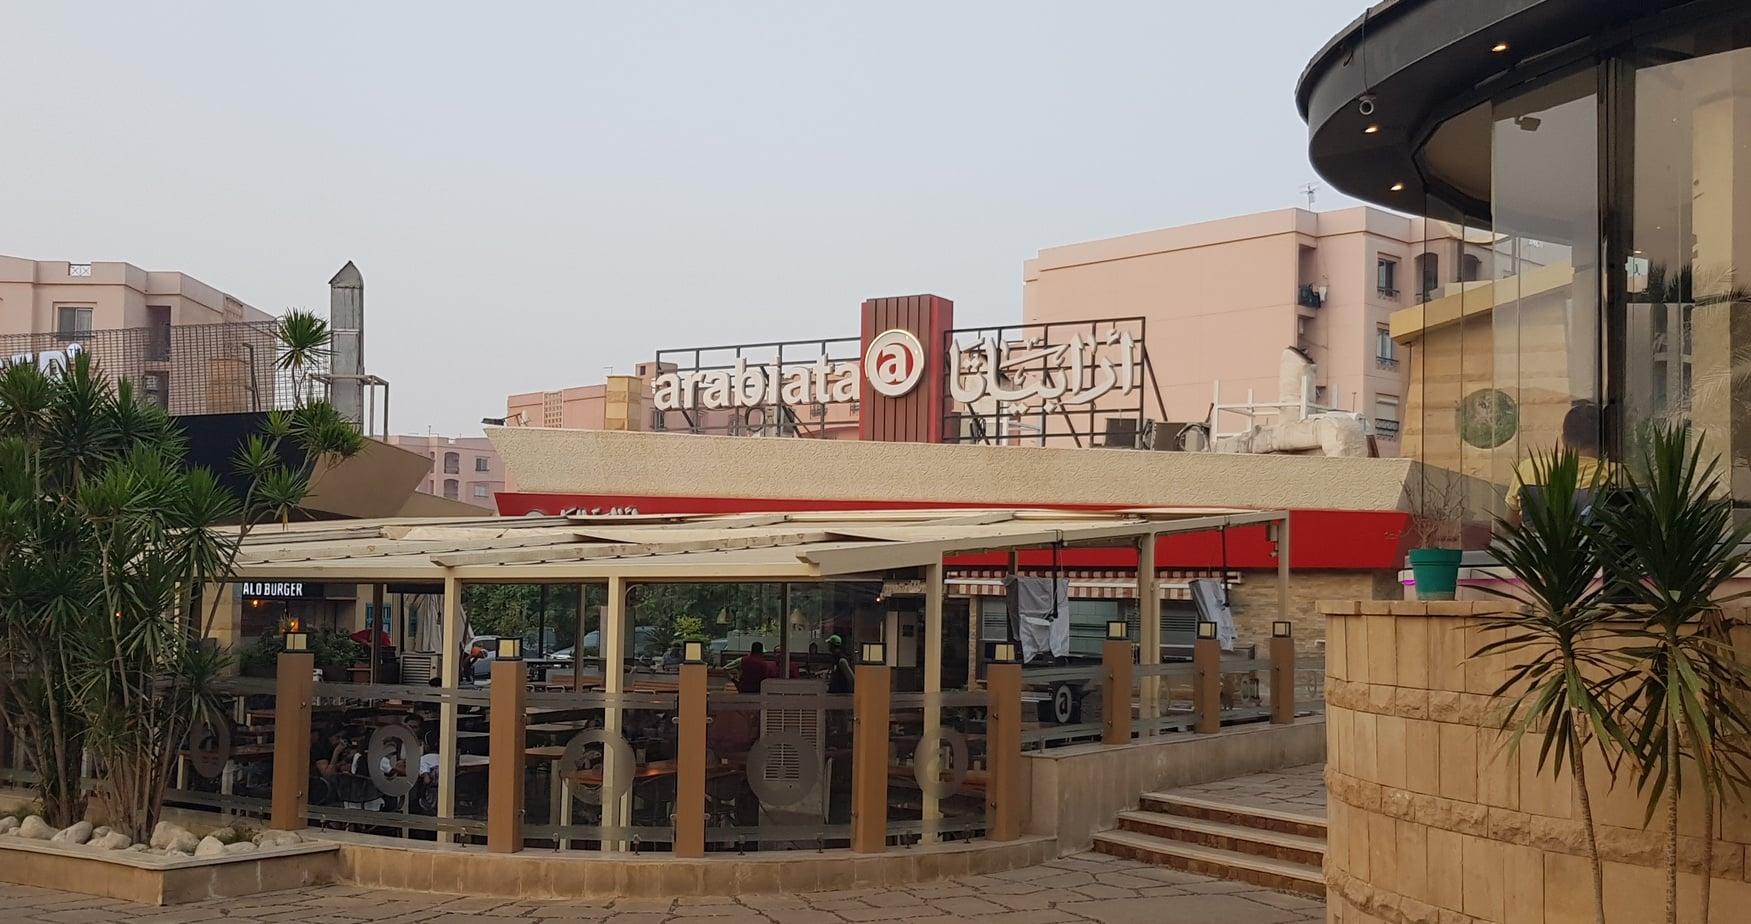 Breakfast in New Cairo: Arabiata (El Shabrawy) Review